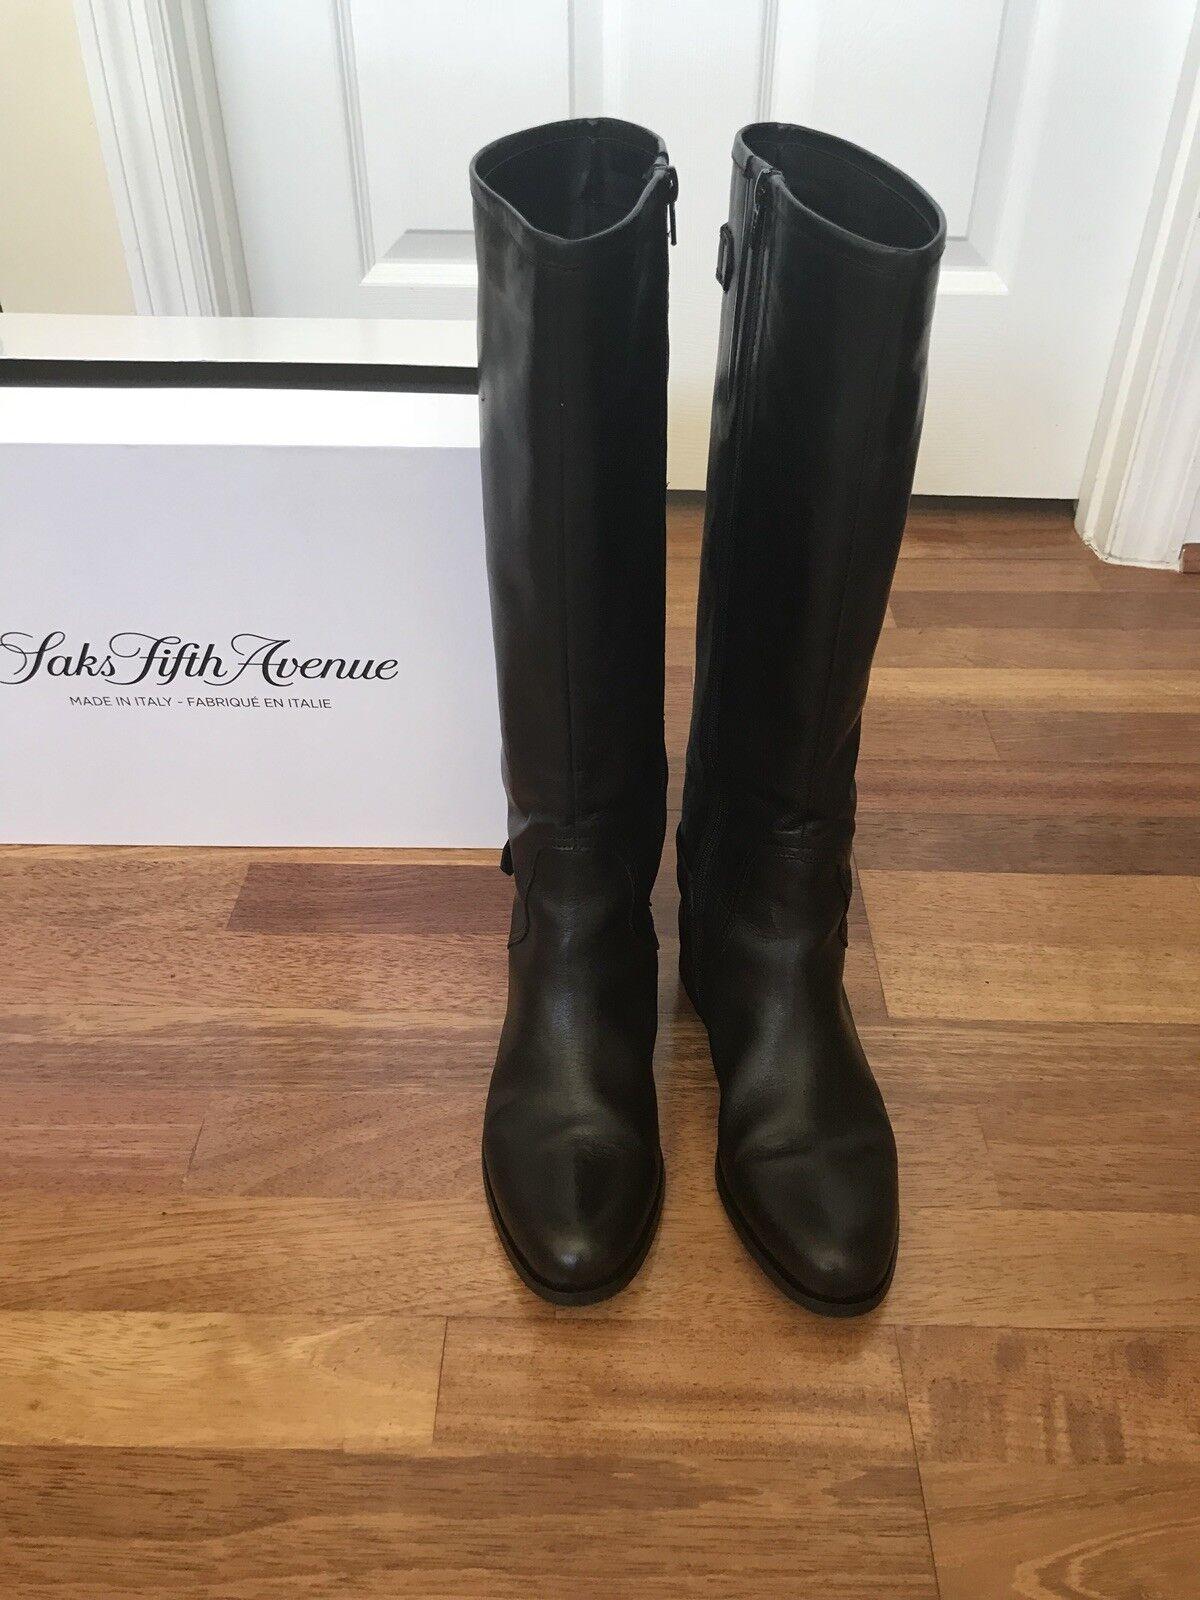 sconto online di vendita Saks Fifth Avenue nero Leather Leather Leather Tall stivali Made in   salutare